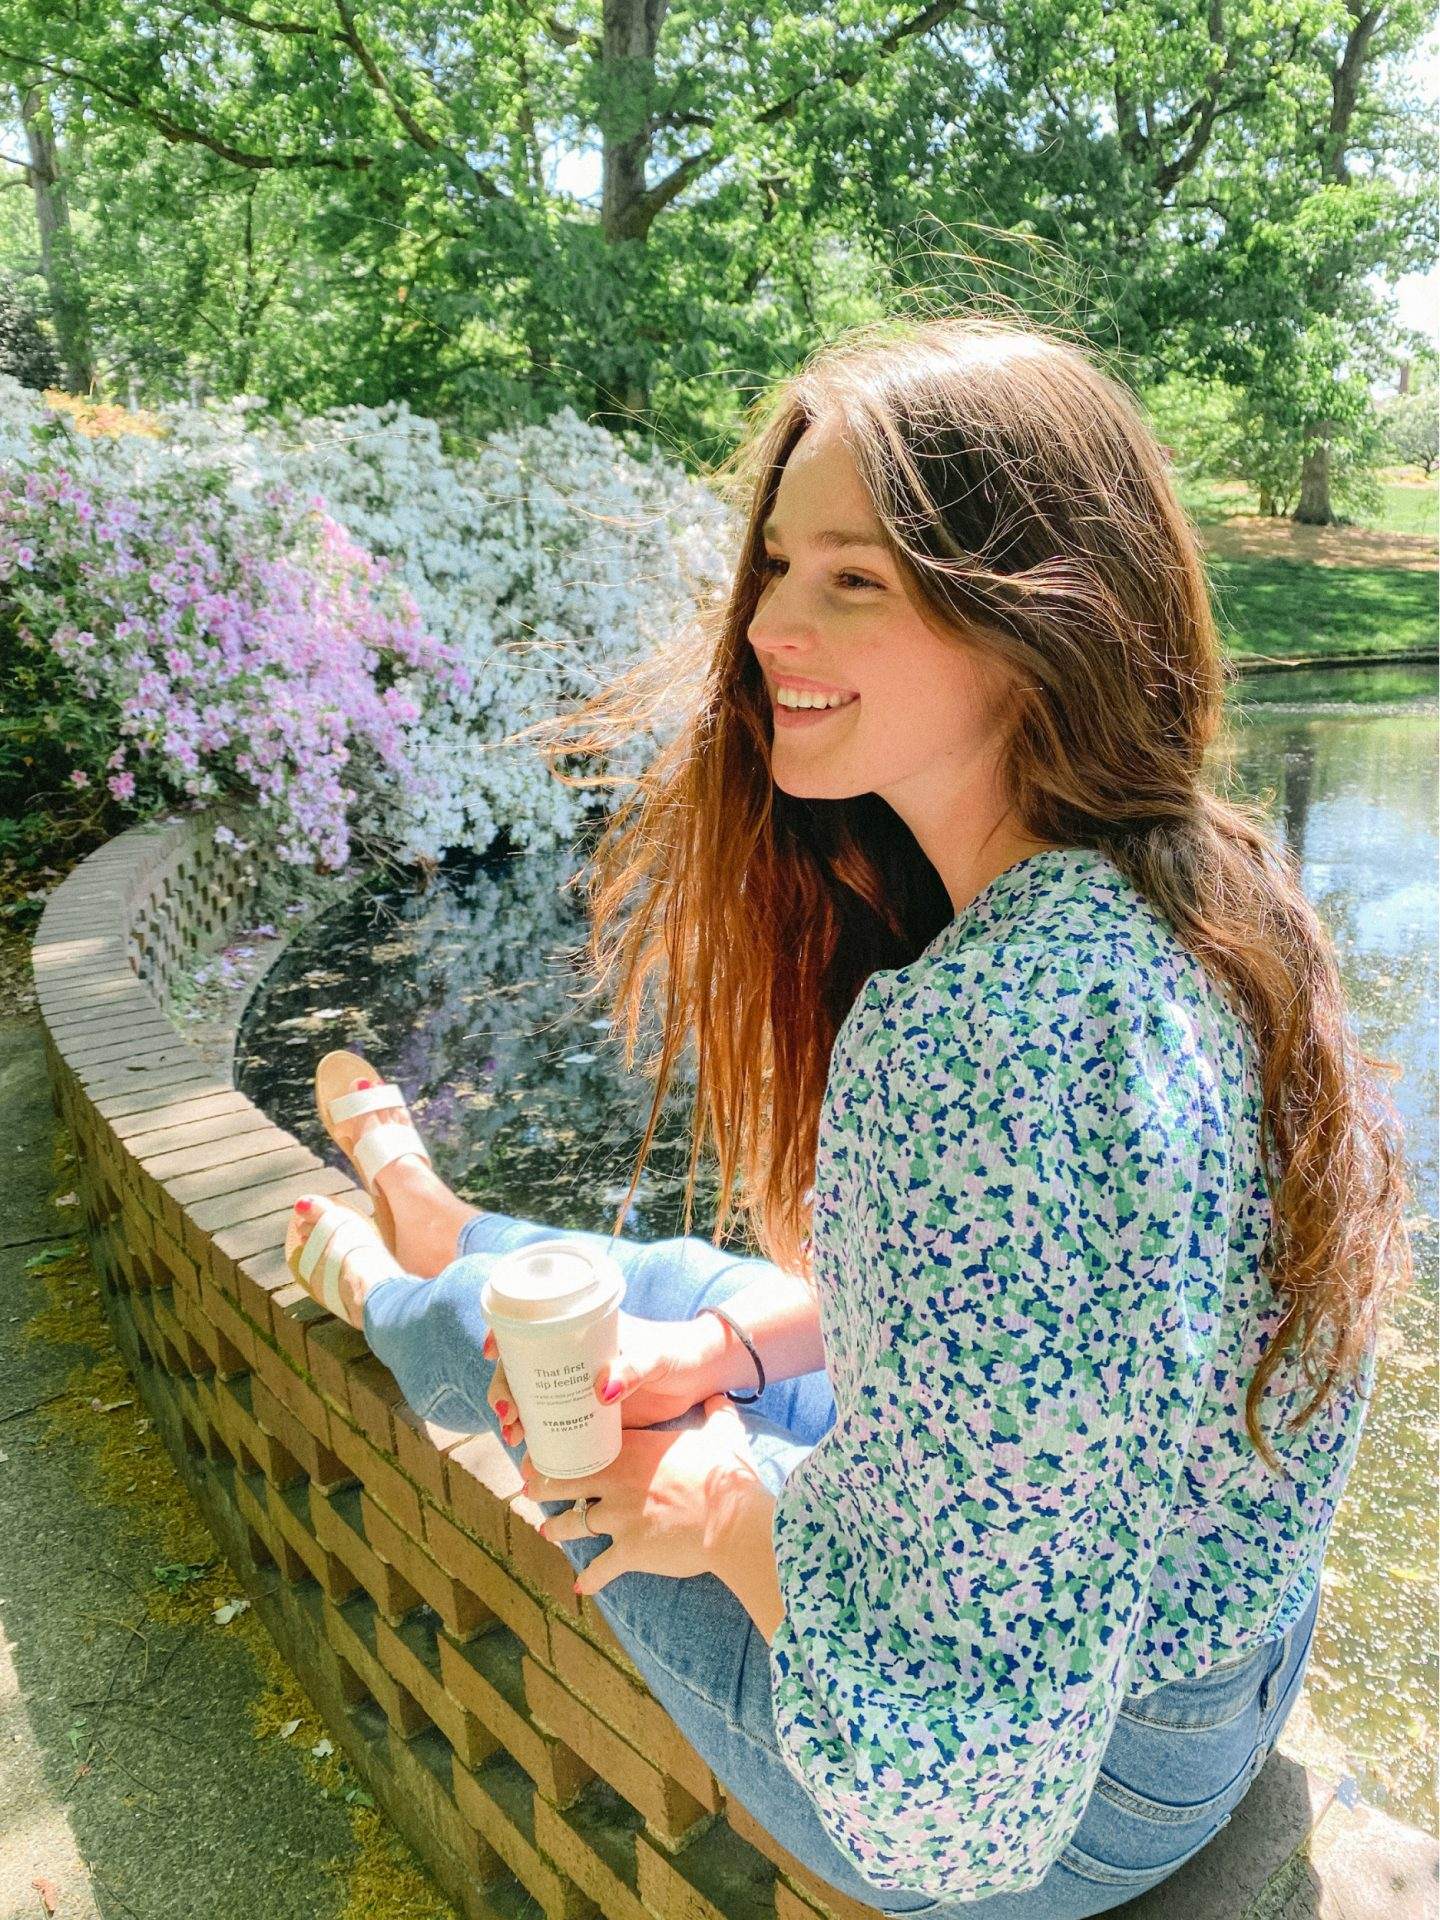 park, rock hill, Glencairn gardens, Winthrop, south Carolina, fort mill, azaleas, flowers, target top, lifestyle blogger, taralynn, mcnitt, life, coffee, almond milk latte, south, North Carolina